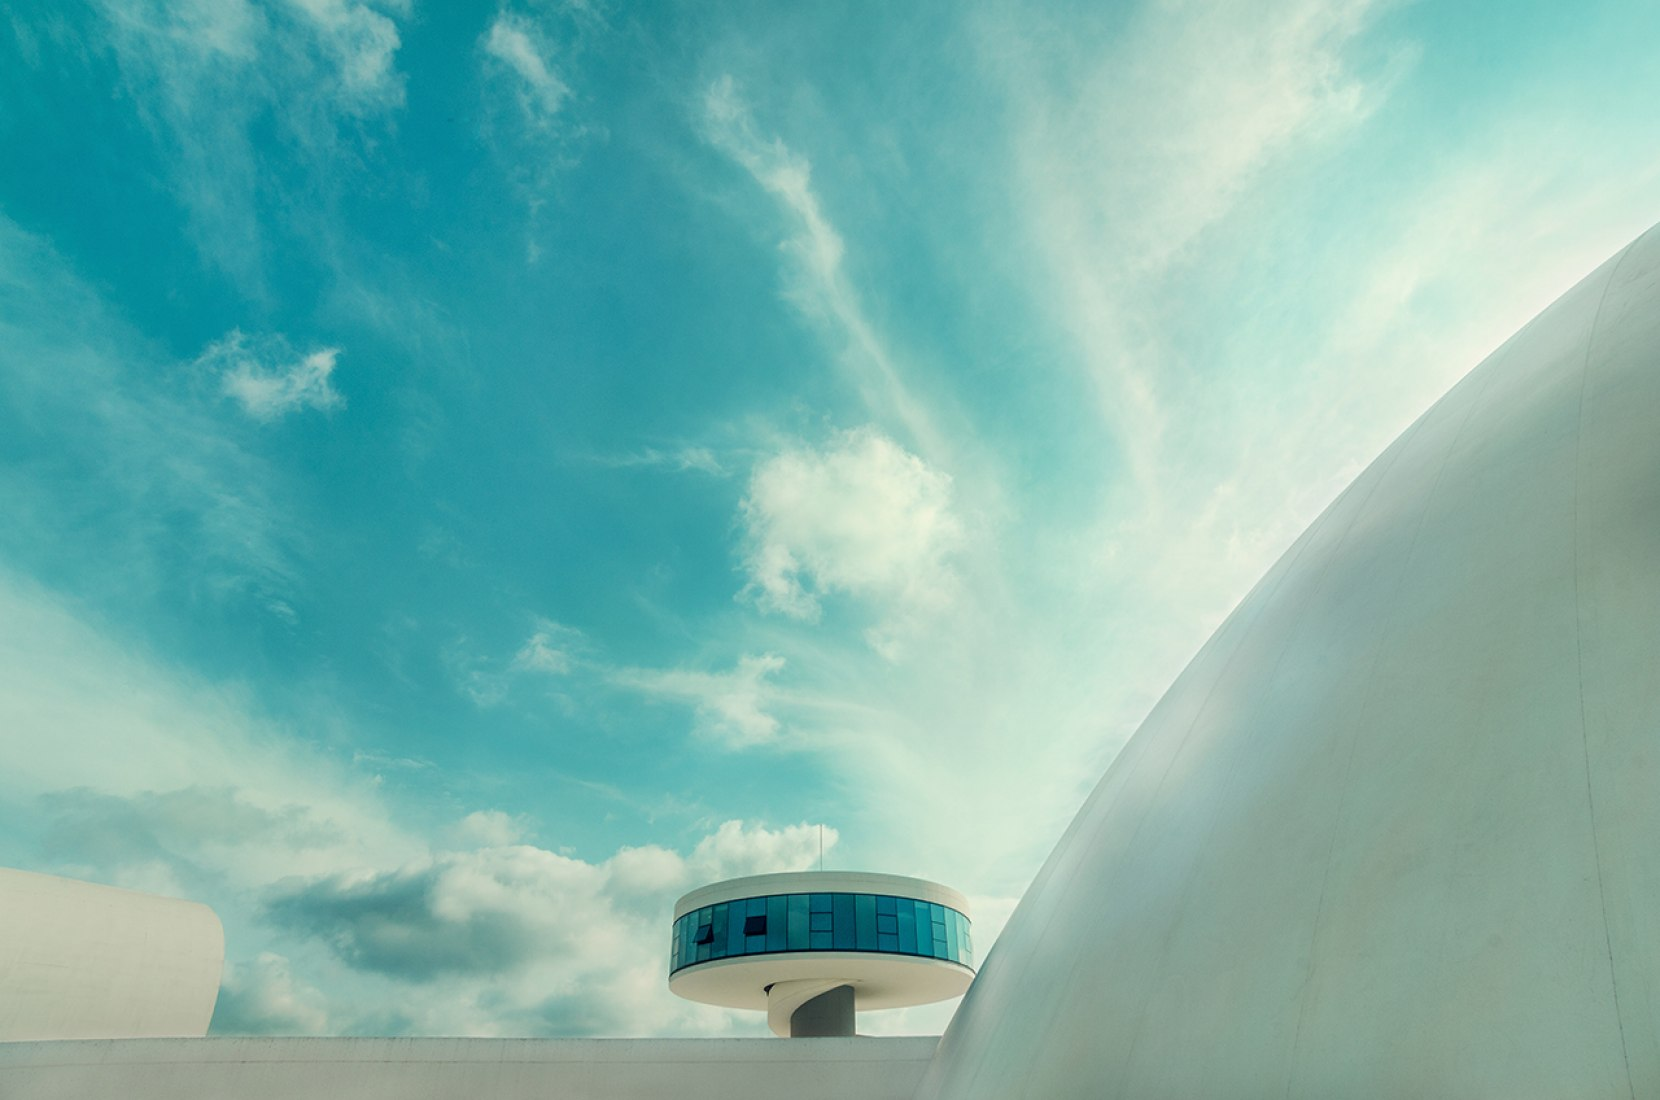 Imágenes del Centro Niemeyer por Jesús M.Chamizo. Fotografía © Jesús M.Chamizo.